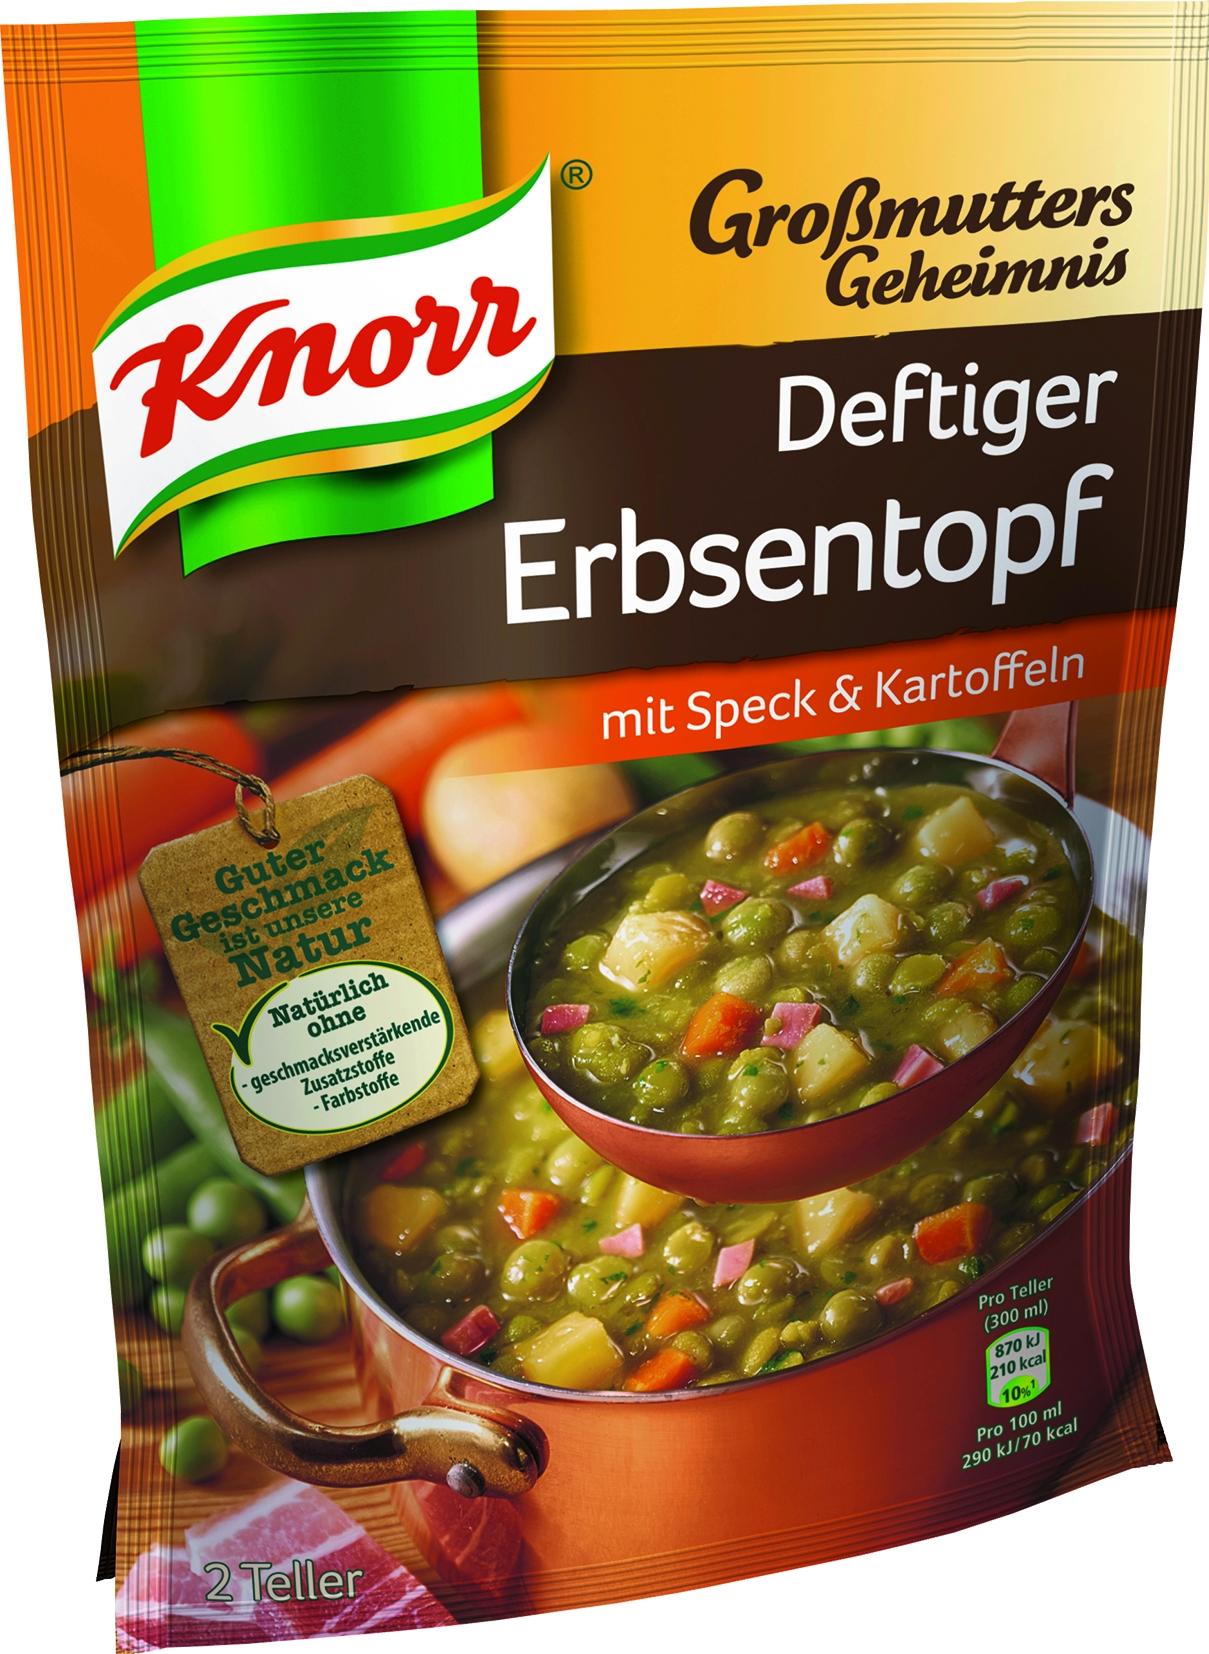 Erbsentopf 2 Teller